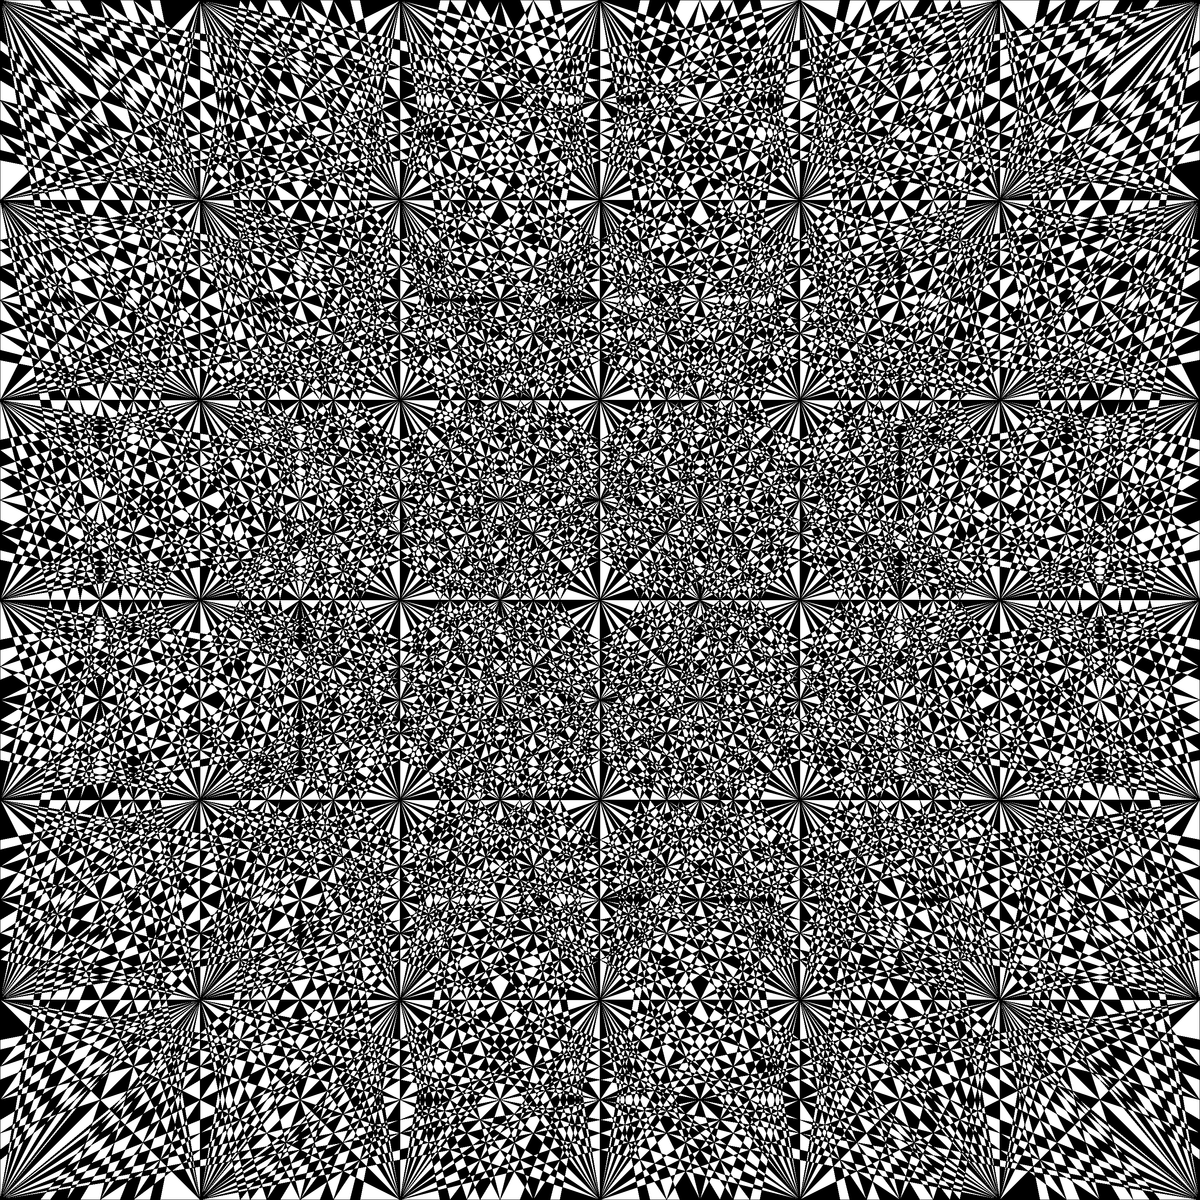 f:id:Hassium277:20200218213324p:plain